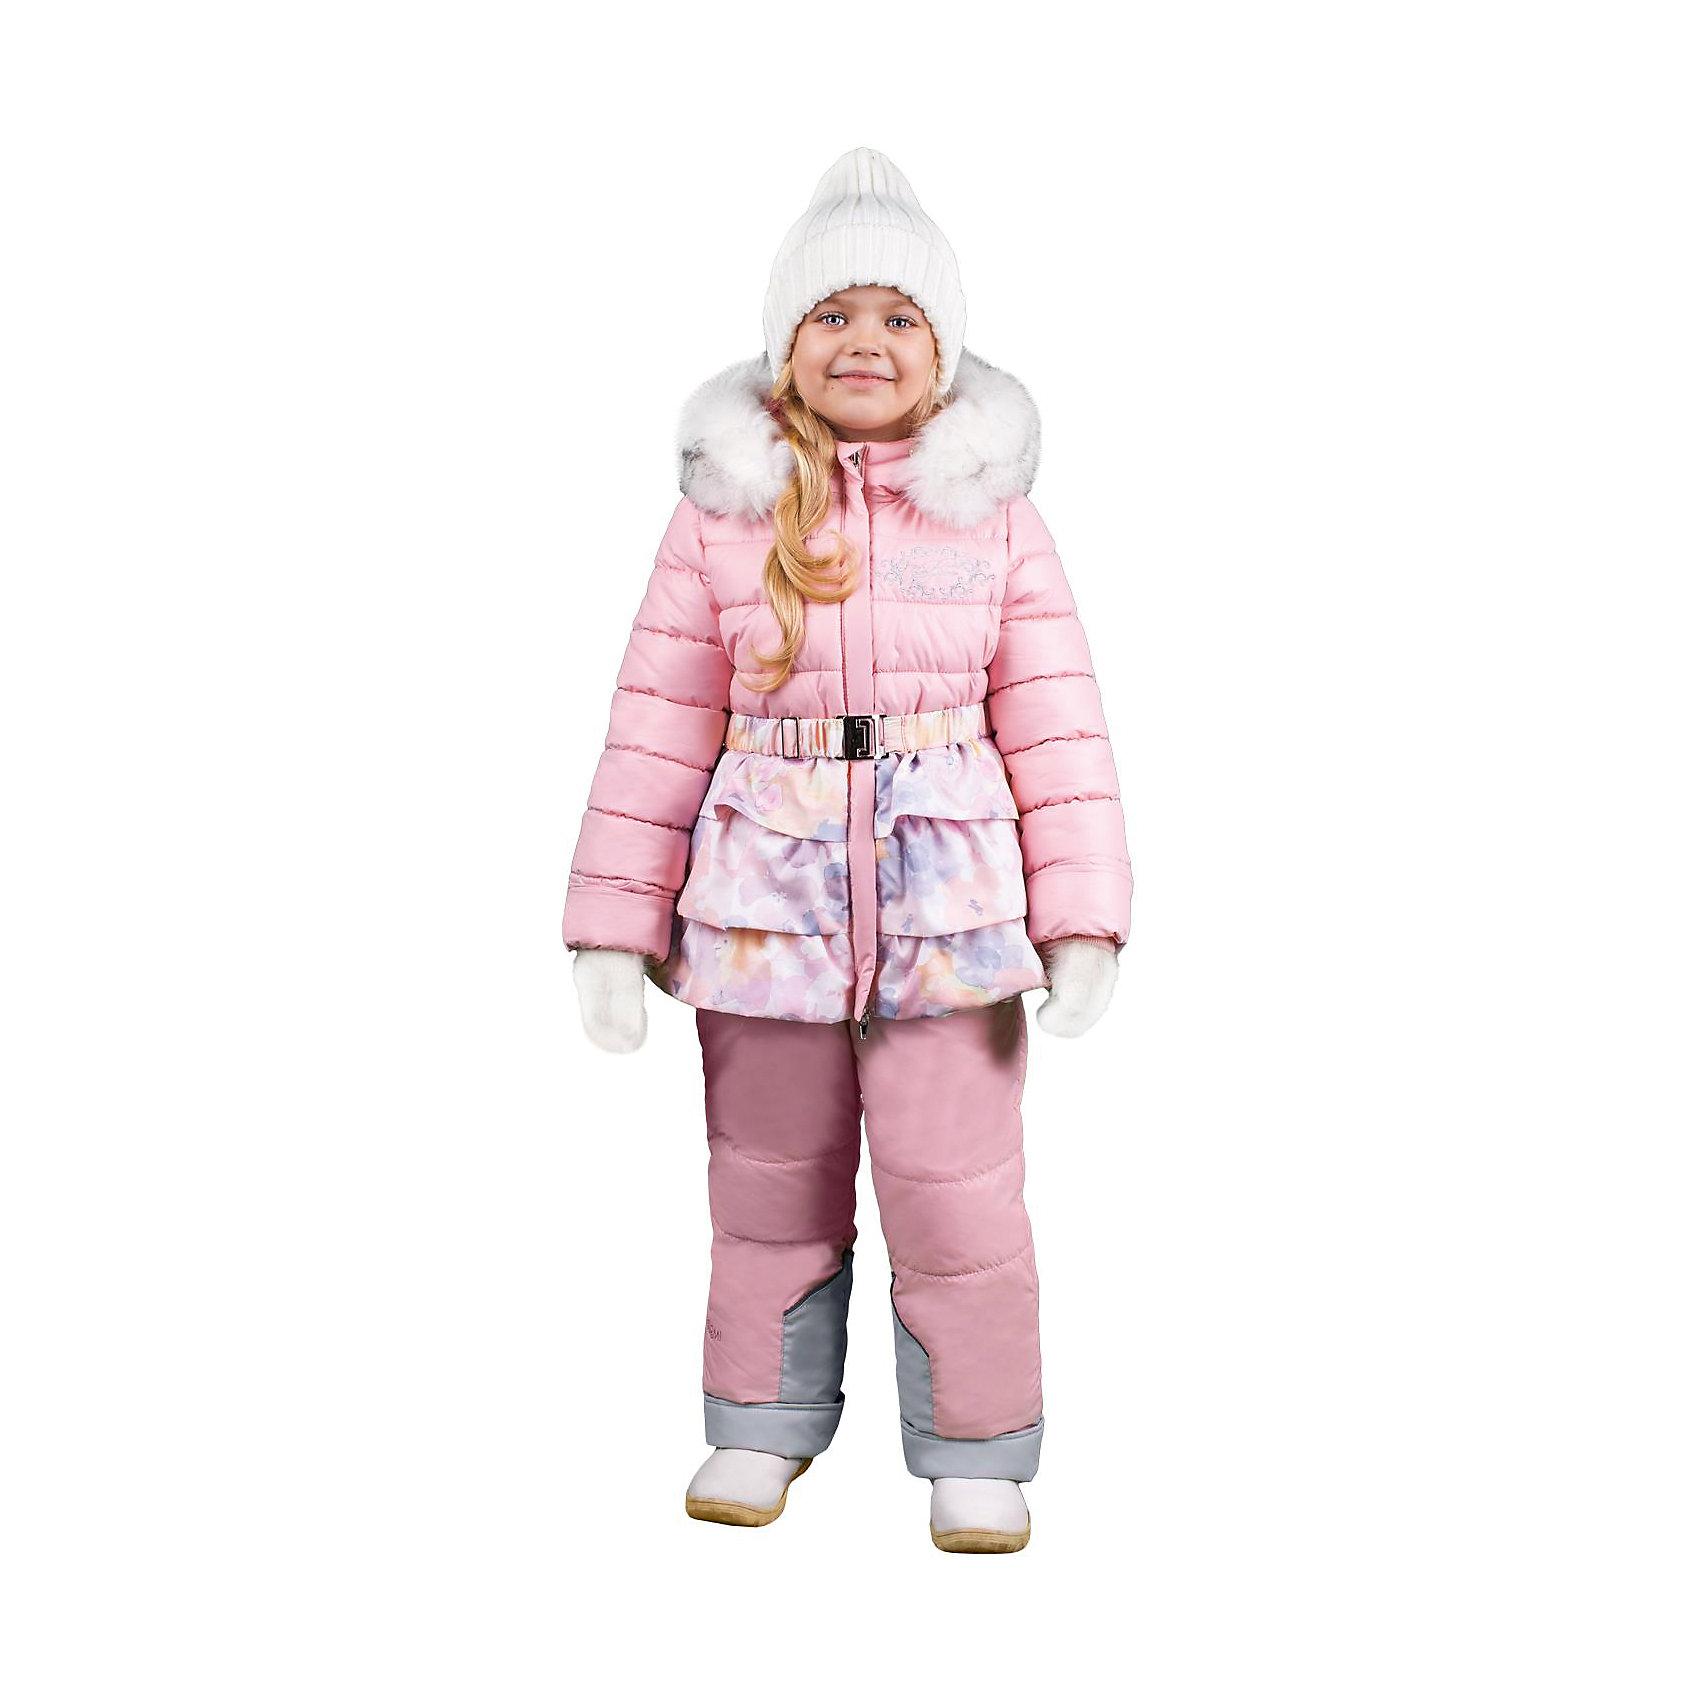 BOOM by Orby Комплект: курта и брюки для девочки BOOM by Orby boom by orby комплект курта и брюки для девочки boom by orby